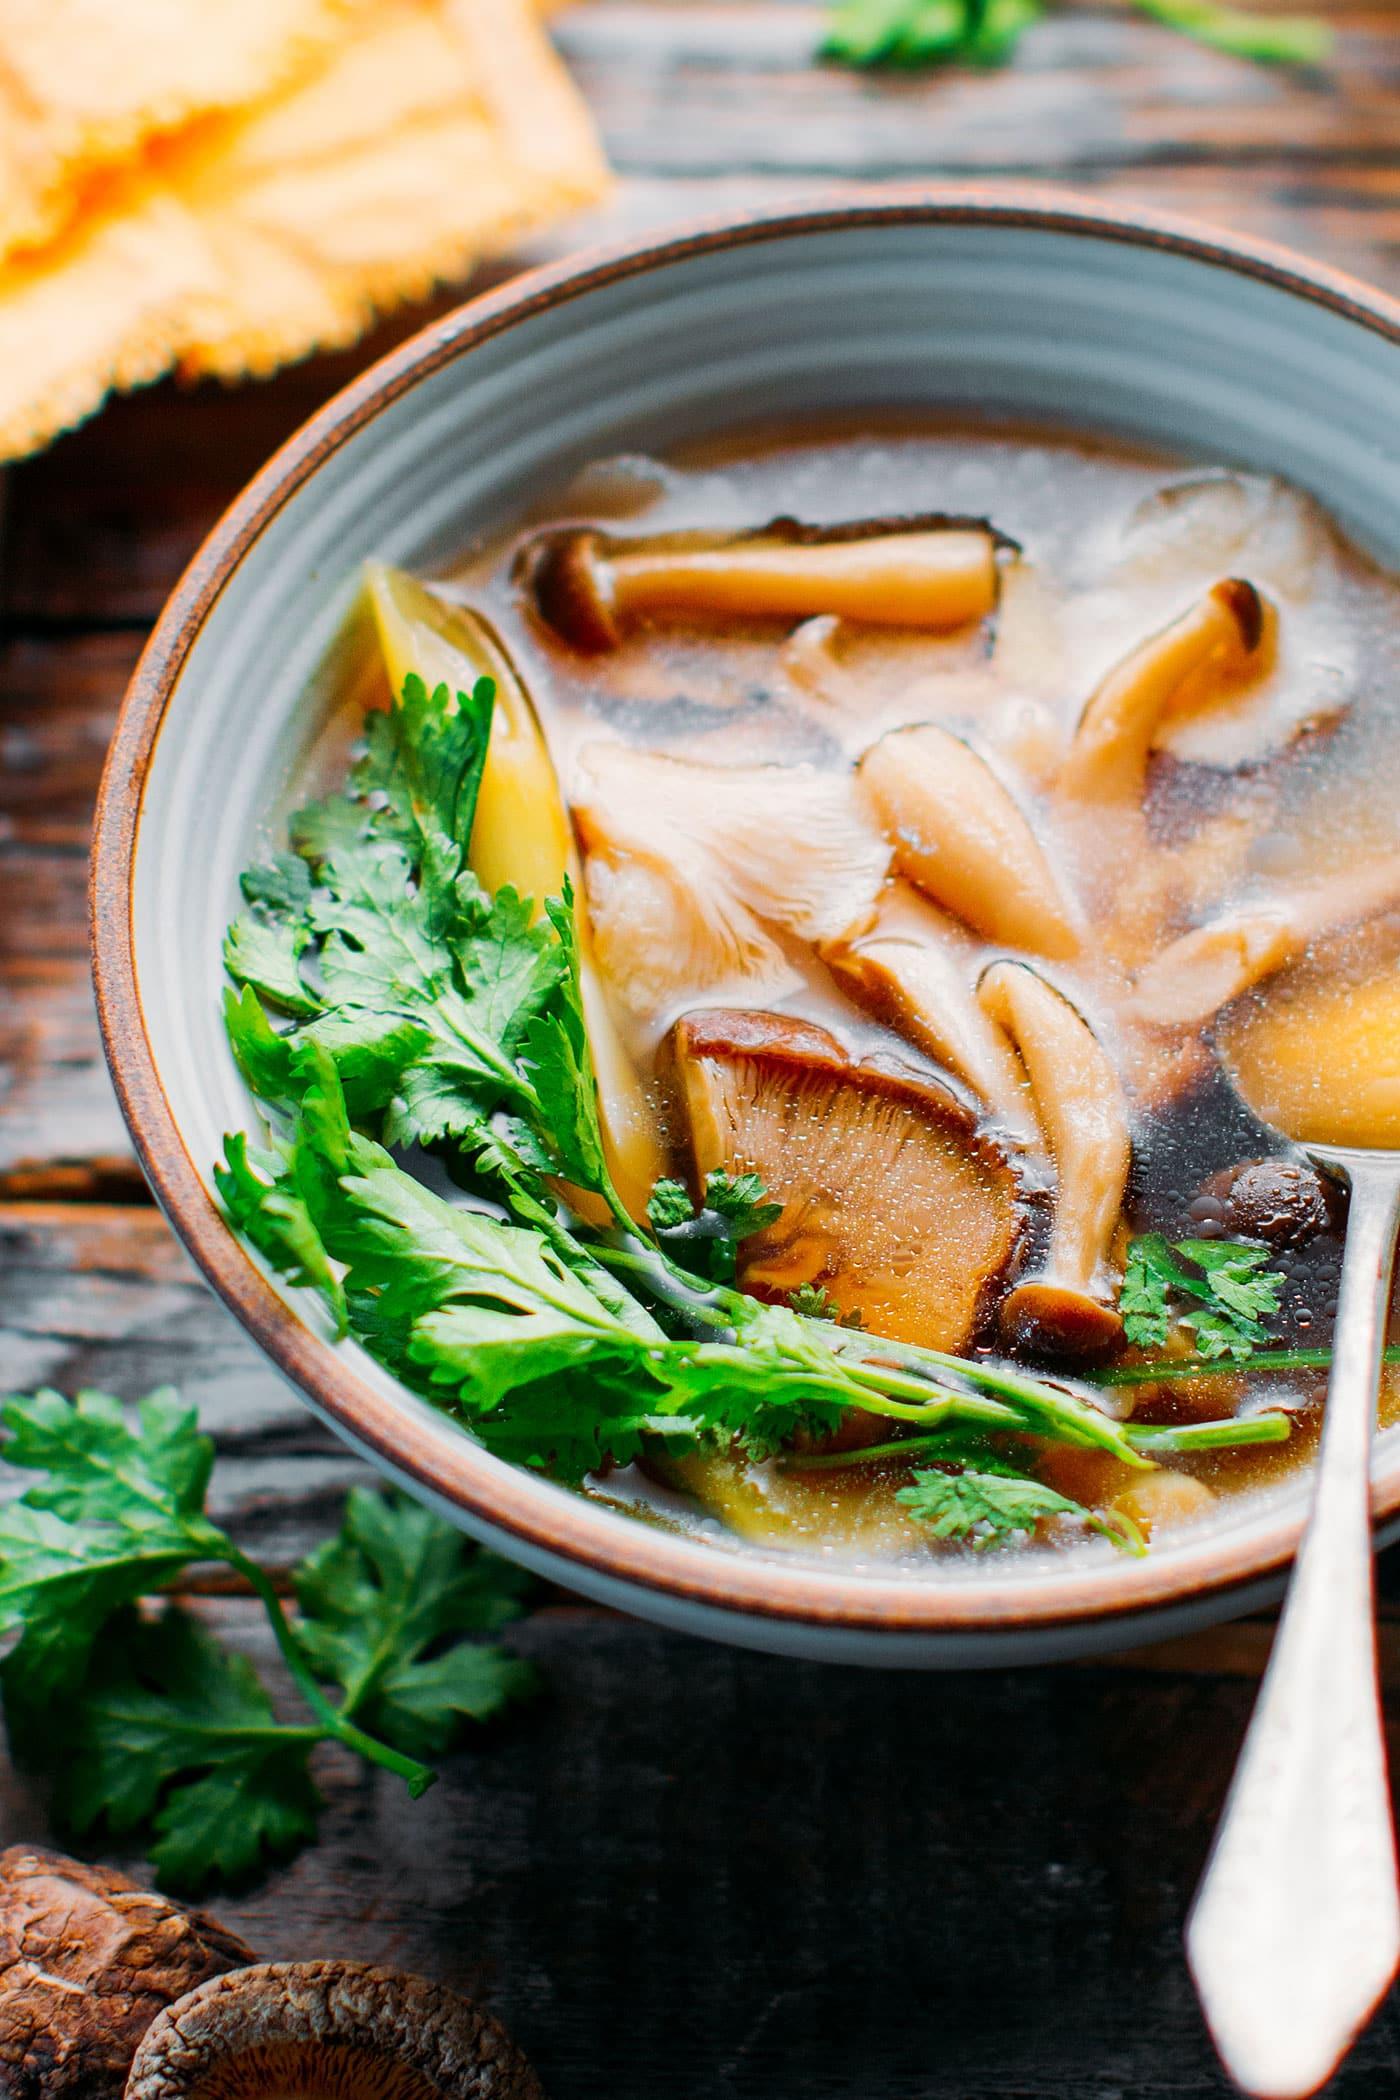 Healing Lemongrass & Mushroom Broth